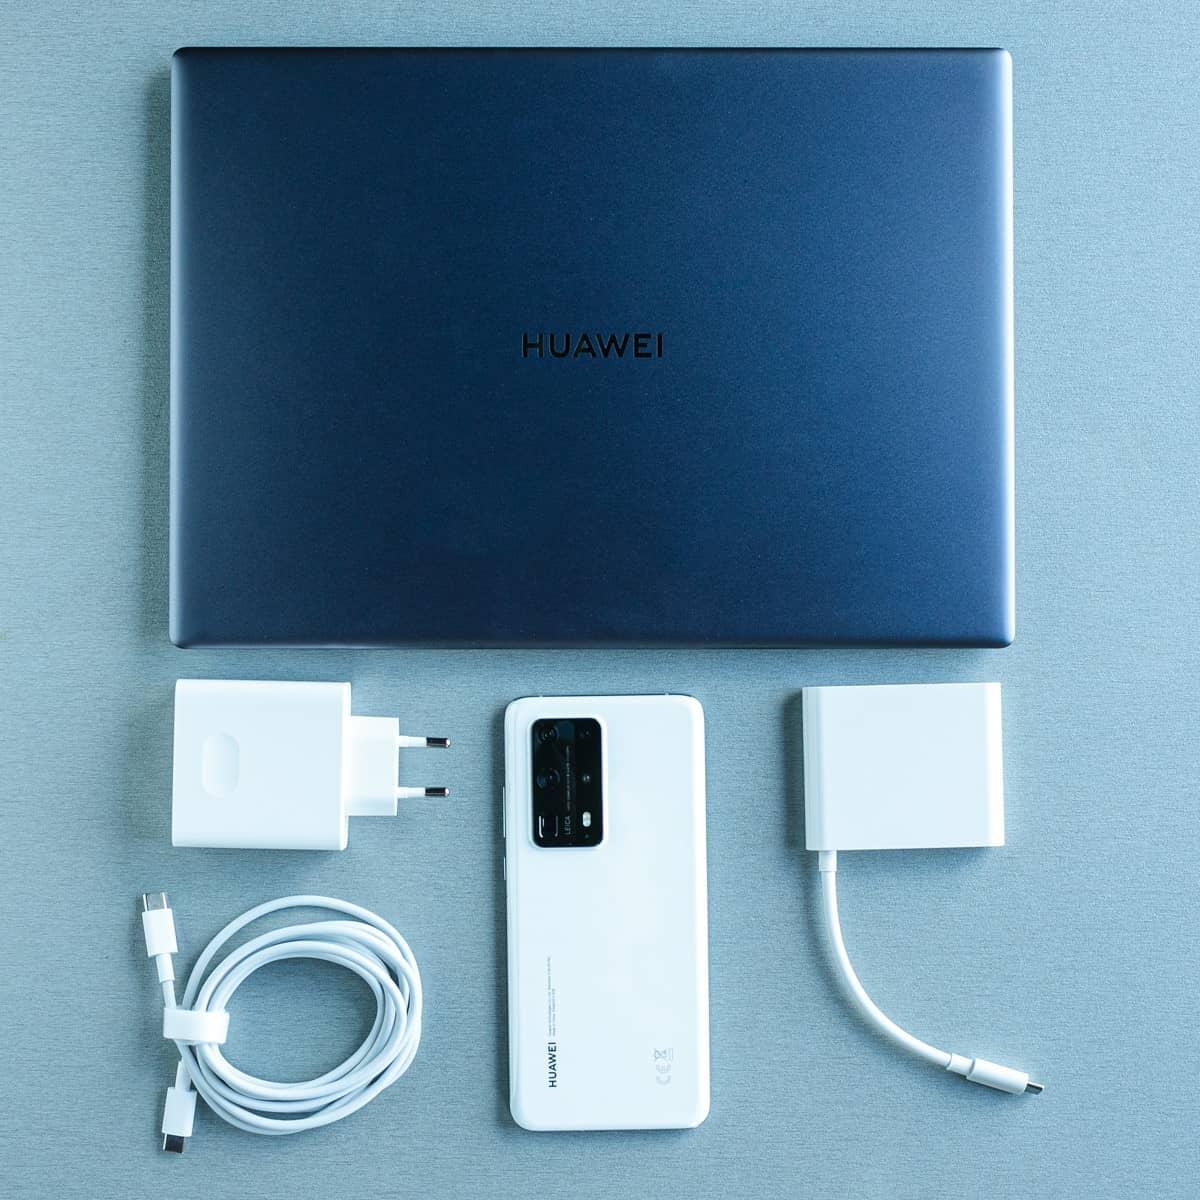 Huawei_MateBook_11